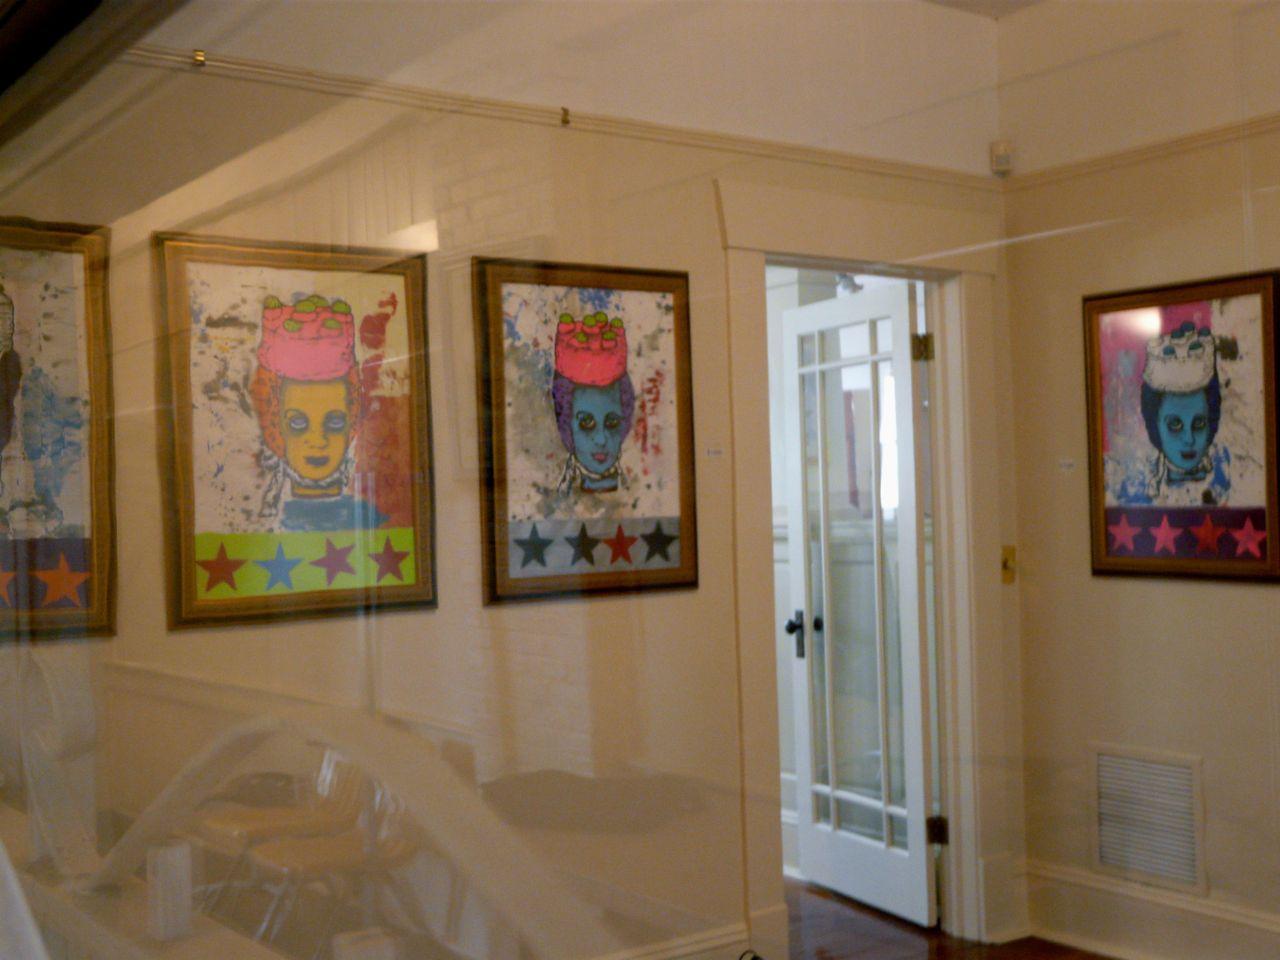 versus gallery through window art.jpg